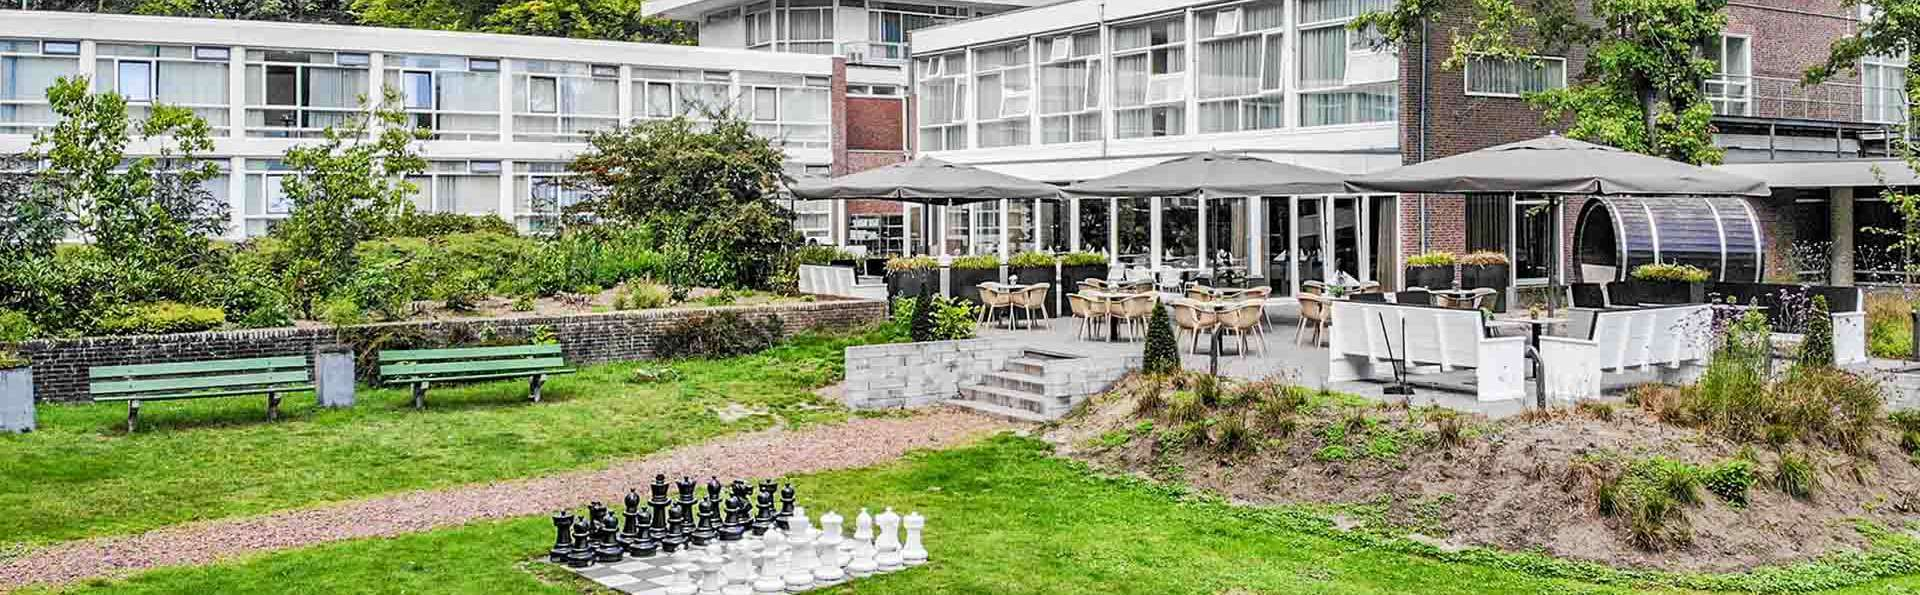 Fletcher Hotel Restaurant Amersfoort - EDIT_Amersfoort-Exterieur-Pand-Luchtfoto_01_-_copia.jpg